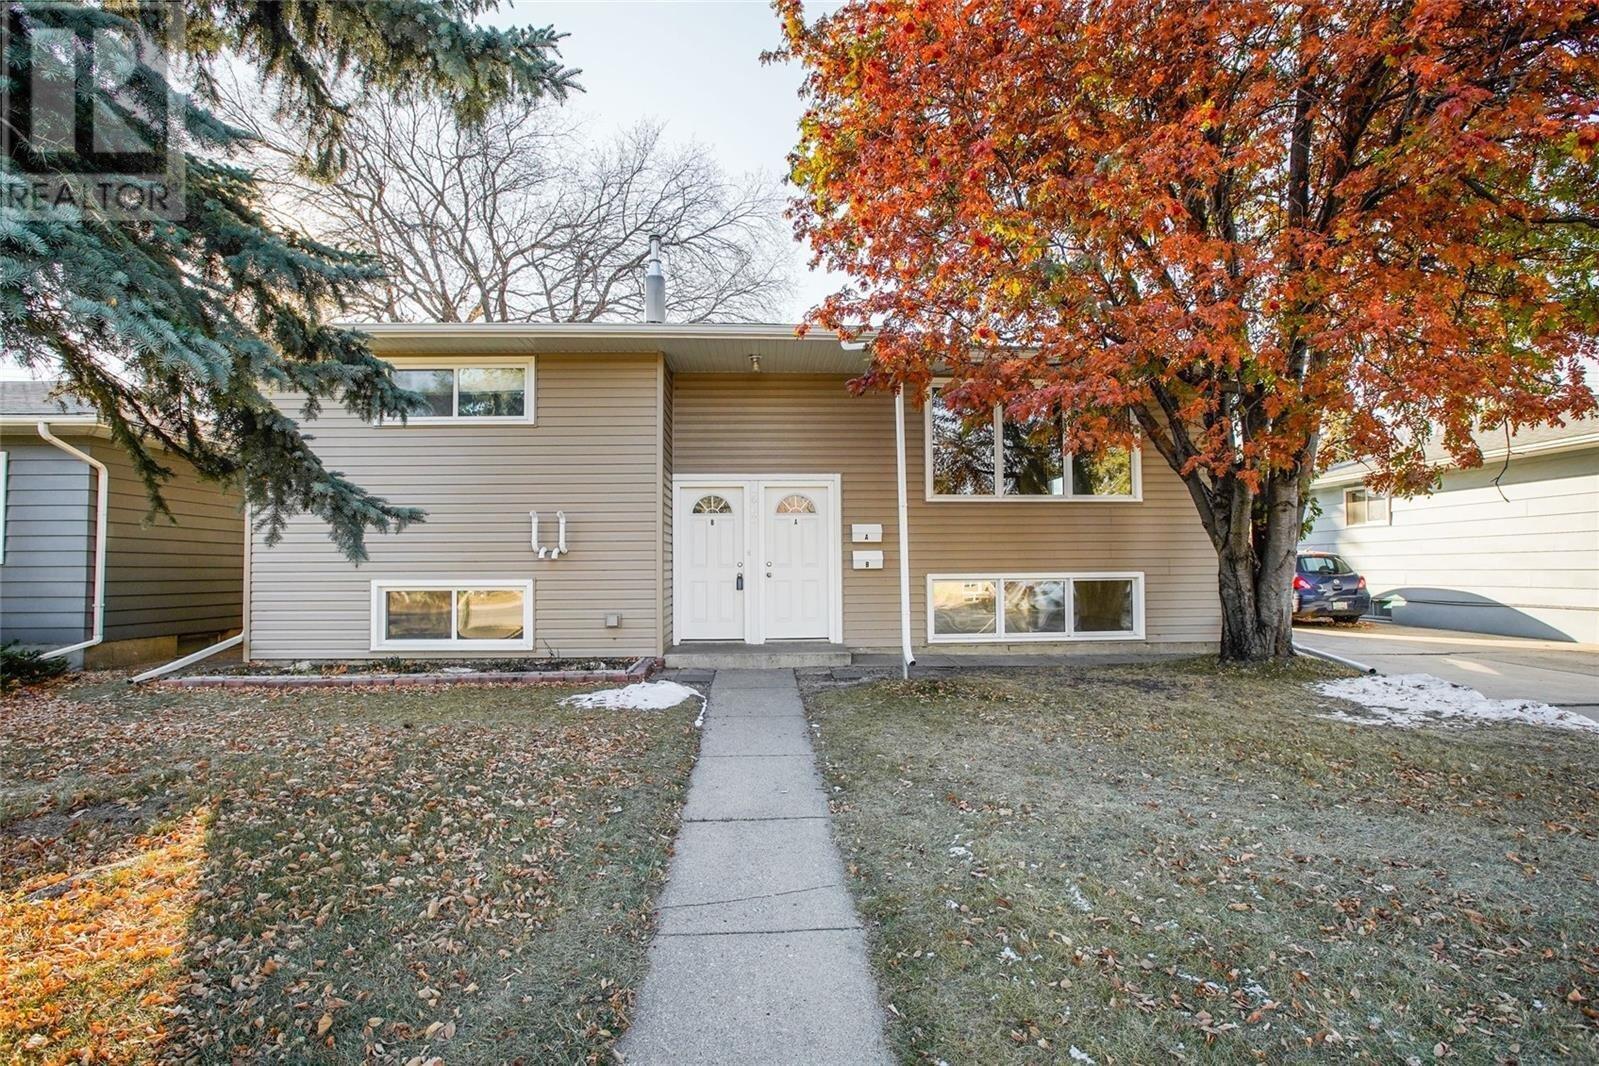 House for sale at 1608 Ruth St E Saskatoon Saskatchewan - MLS: SK831405